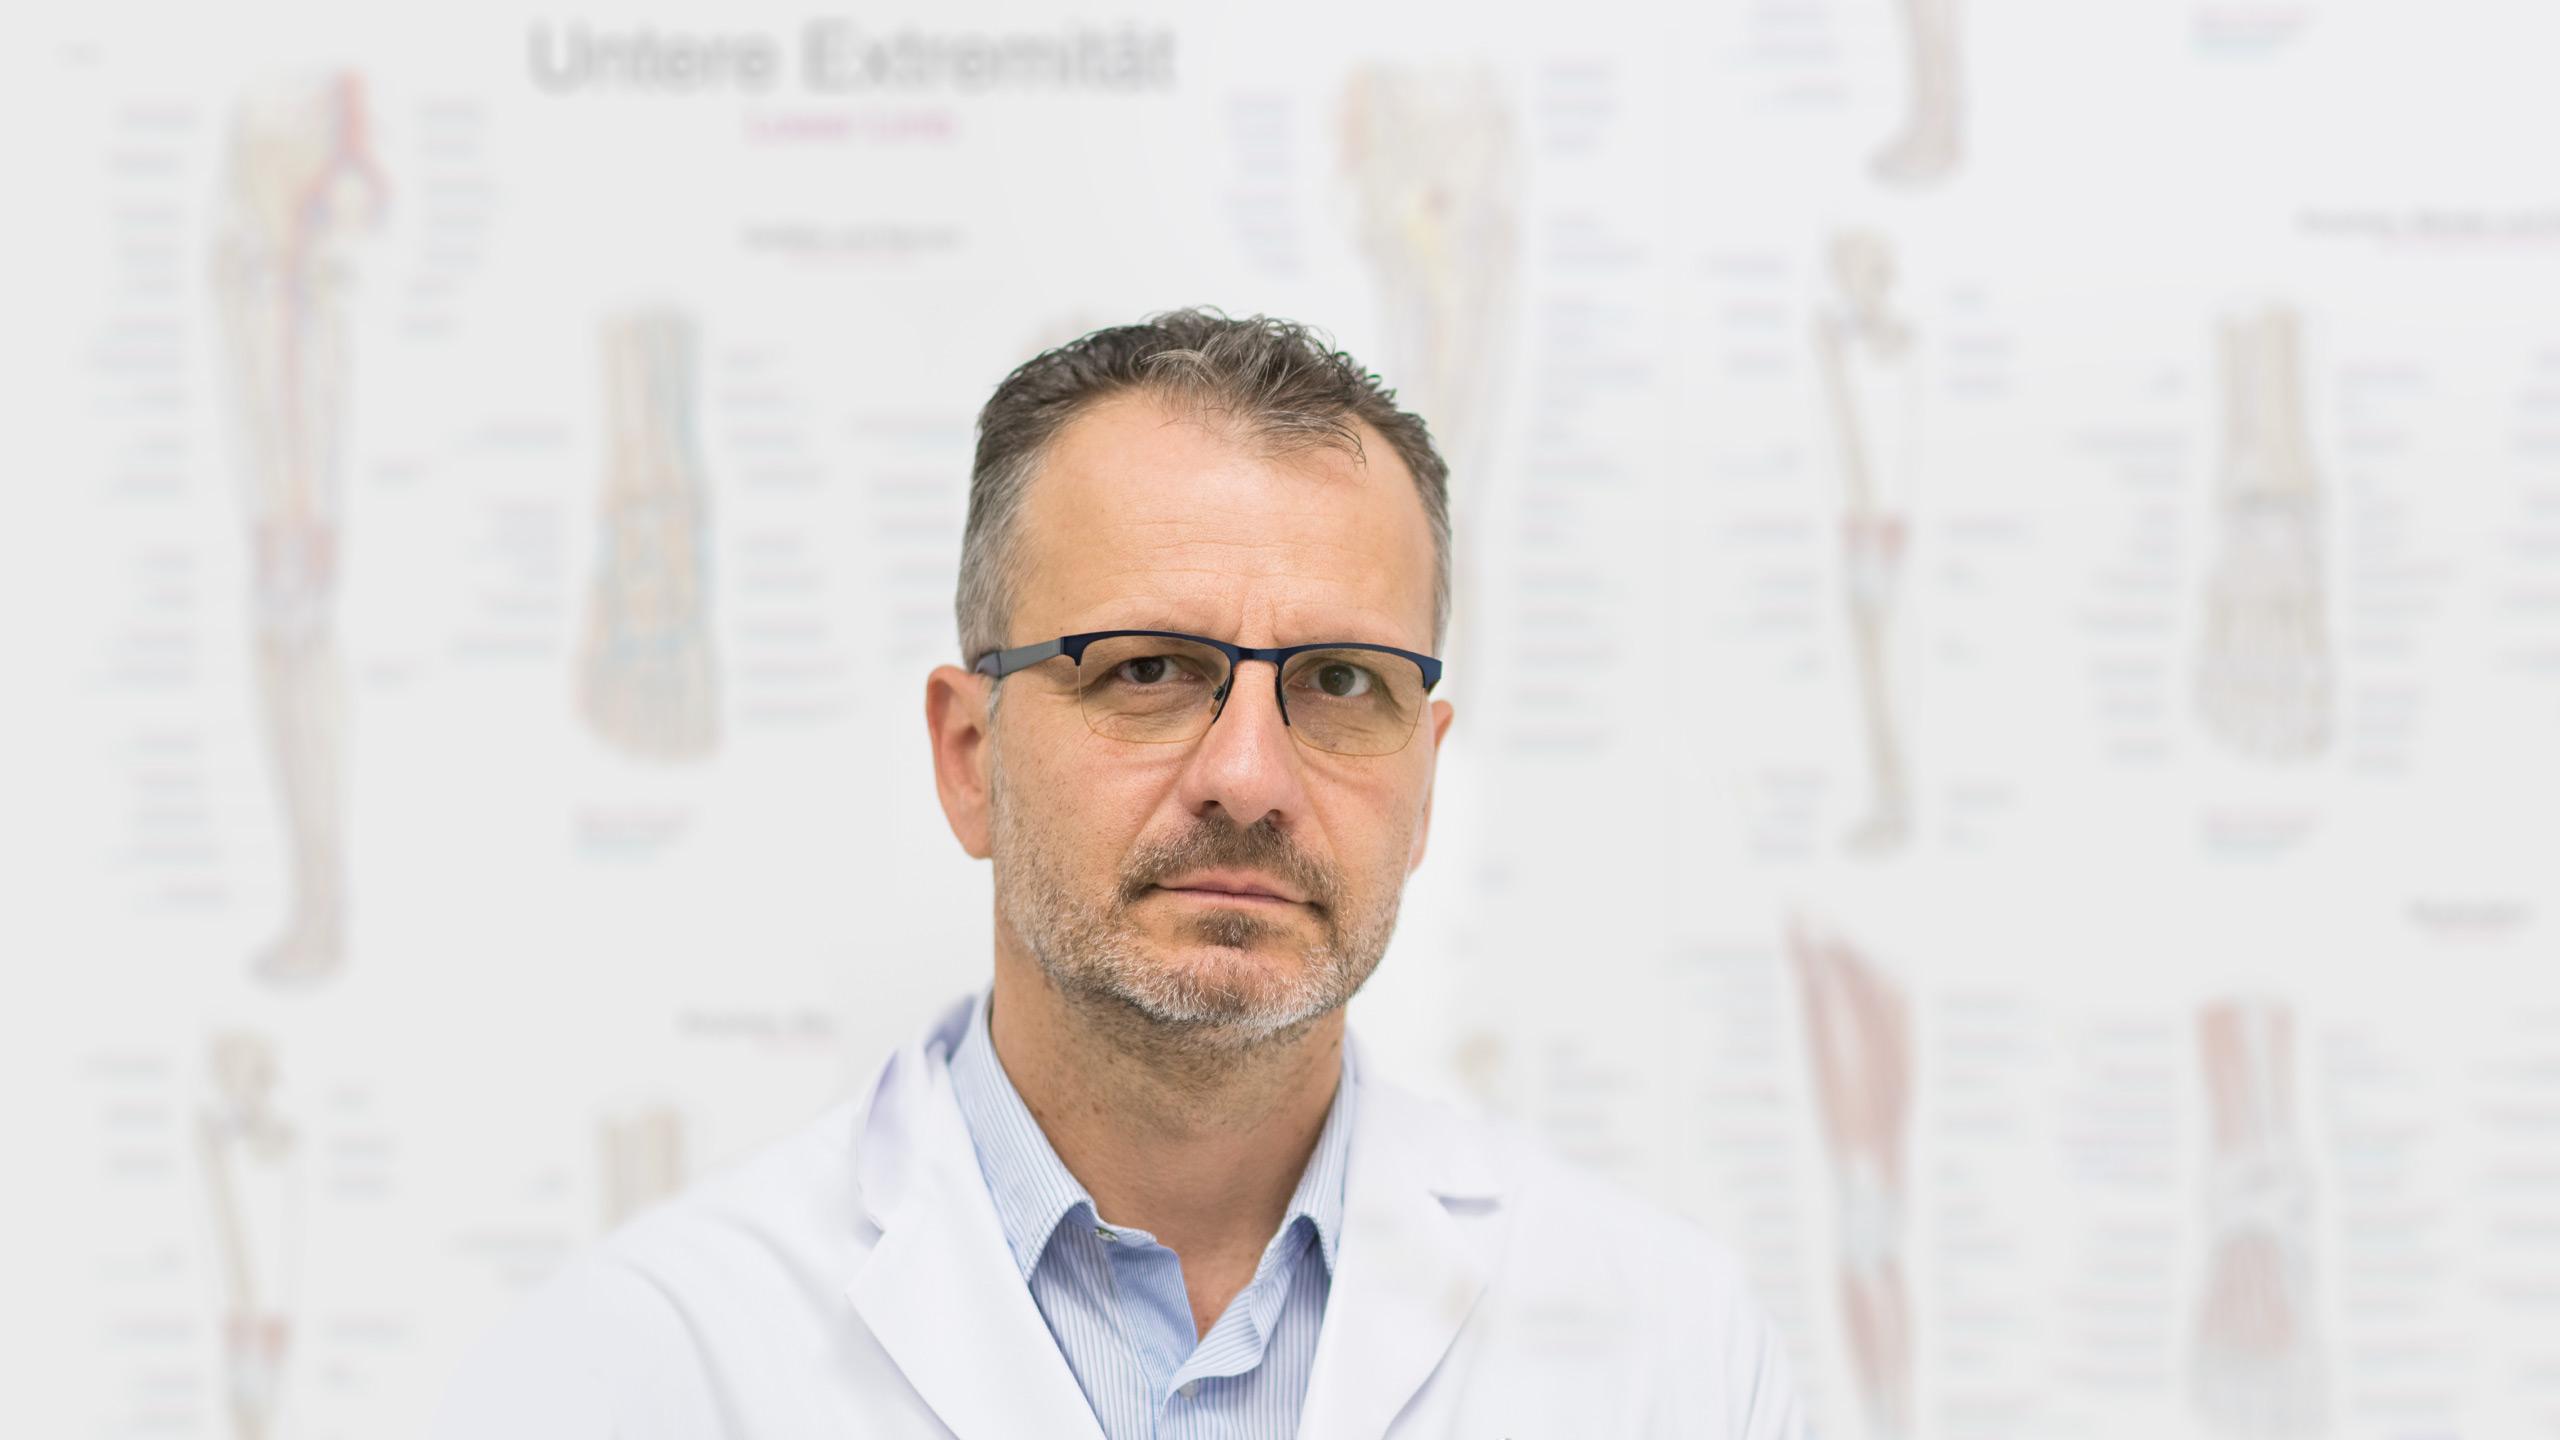 Д-р Владимиров